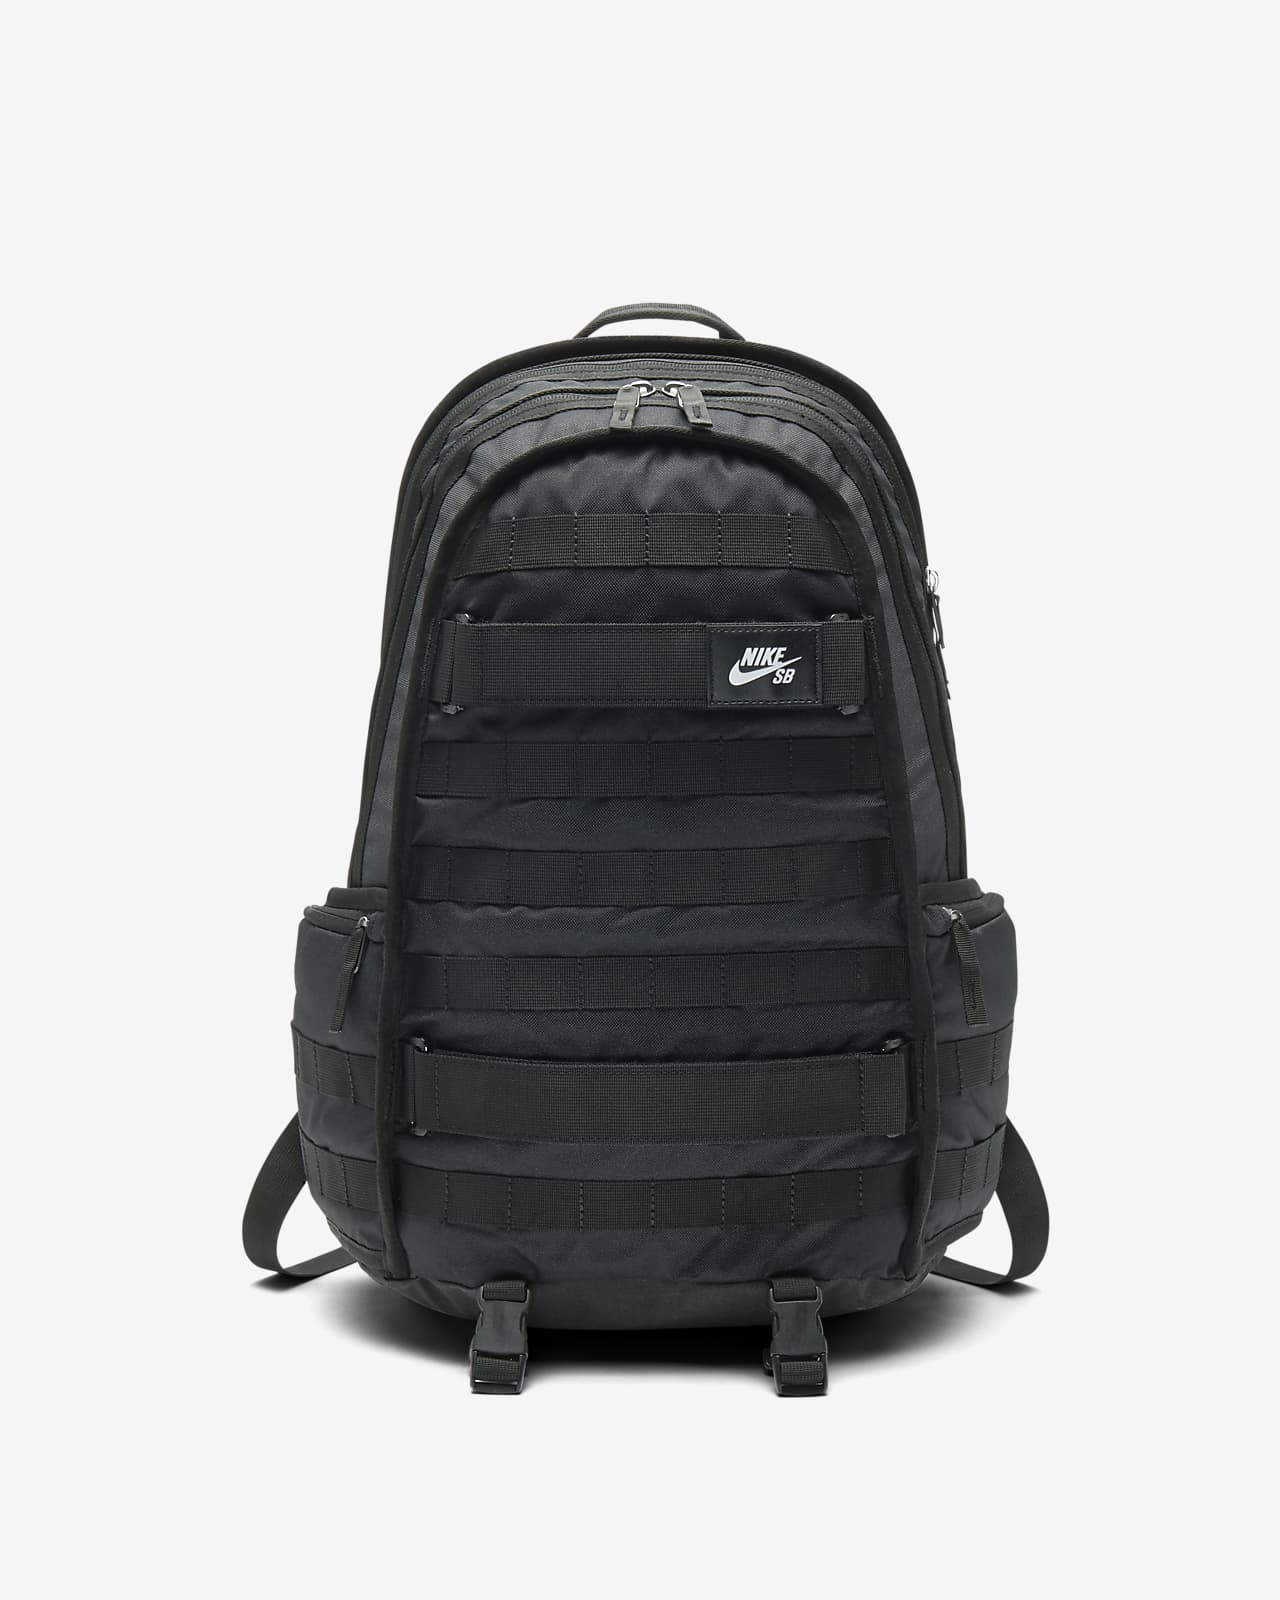 Skateboardryggsäck Nike SB RPM